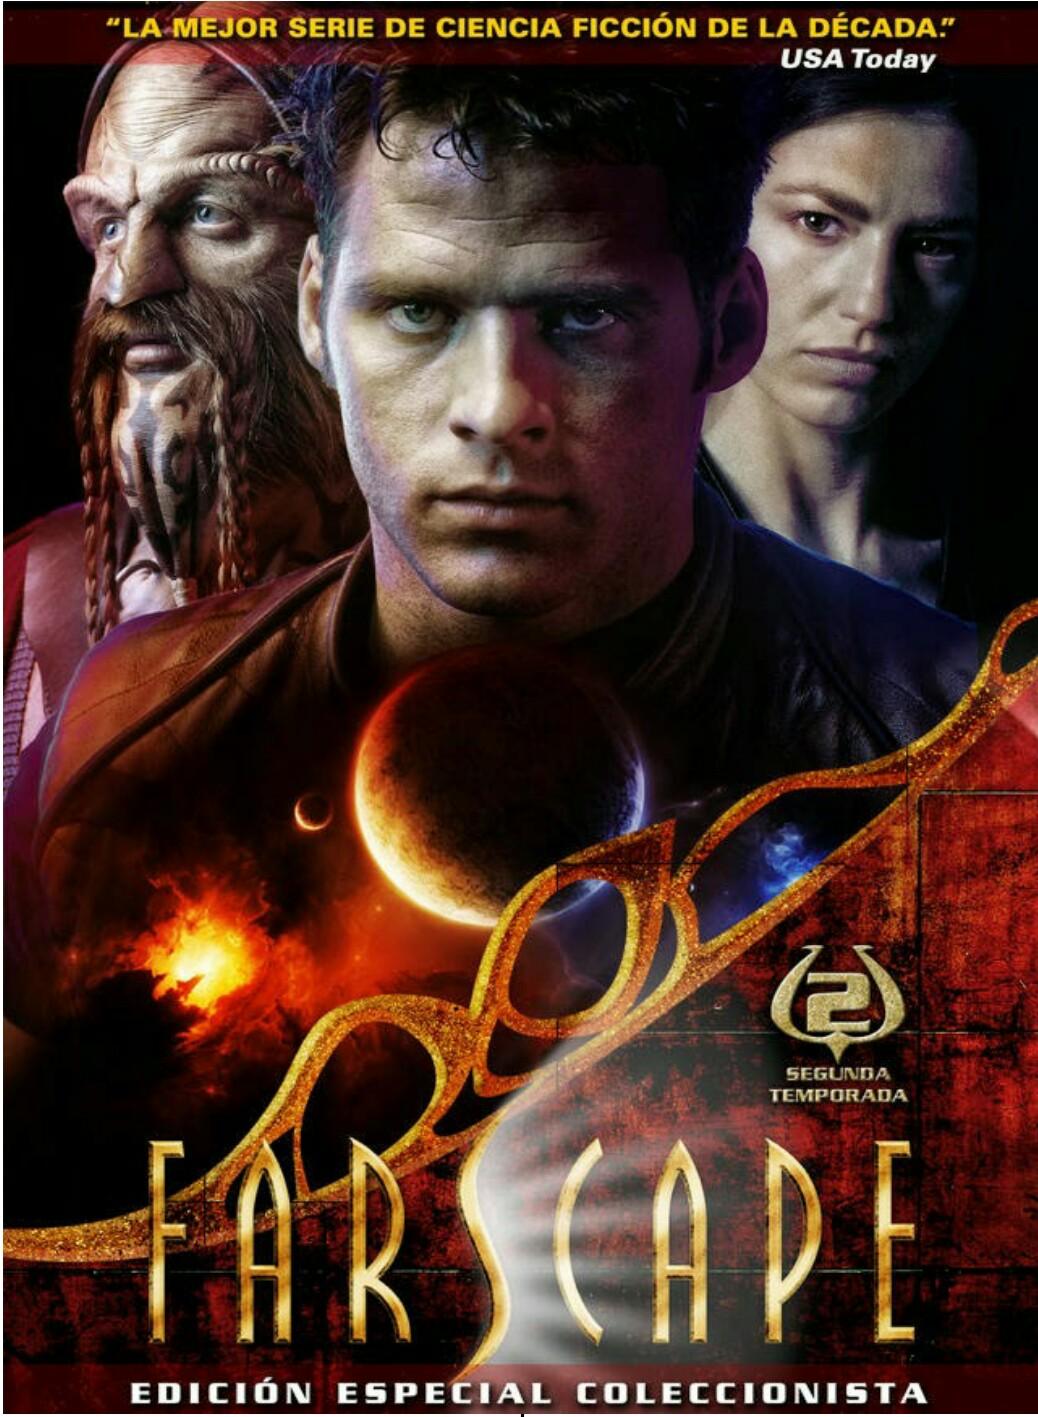 Farscape Temporada 2 DRIP+WEB – 720p  Dual Latino/Ingles